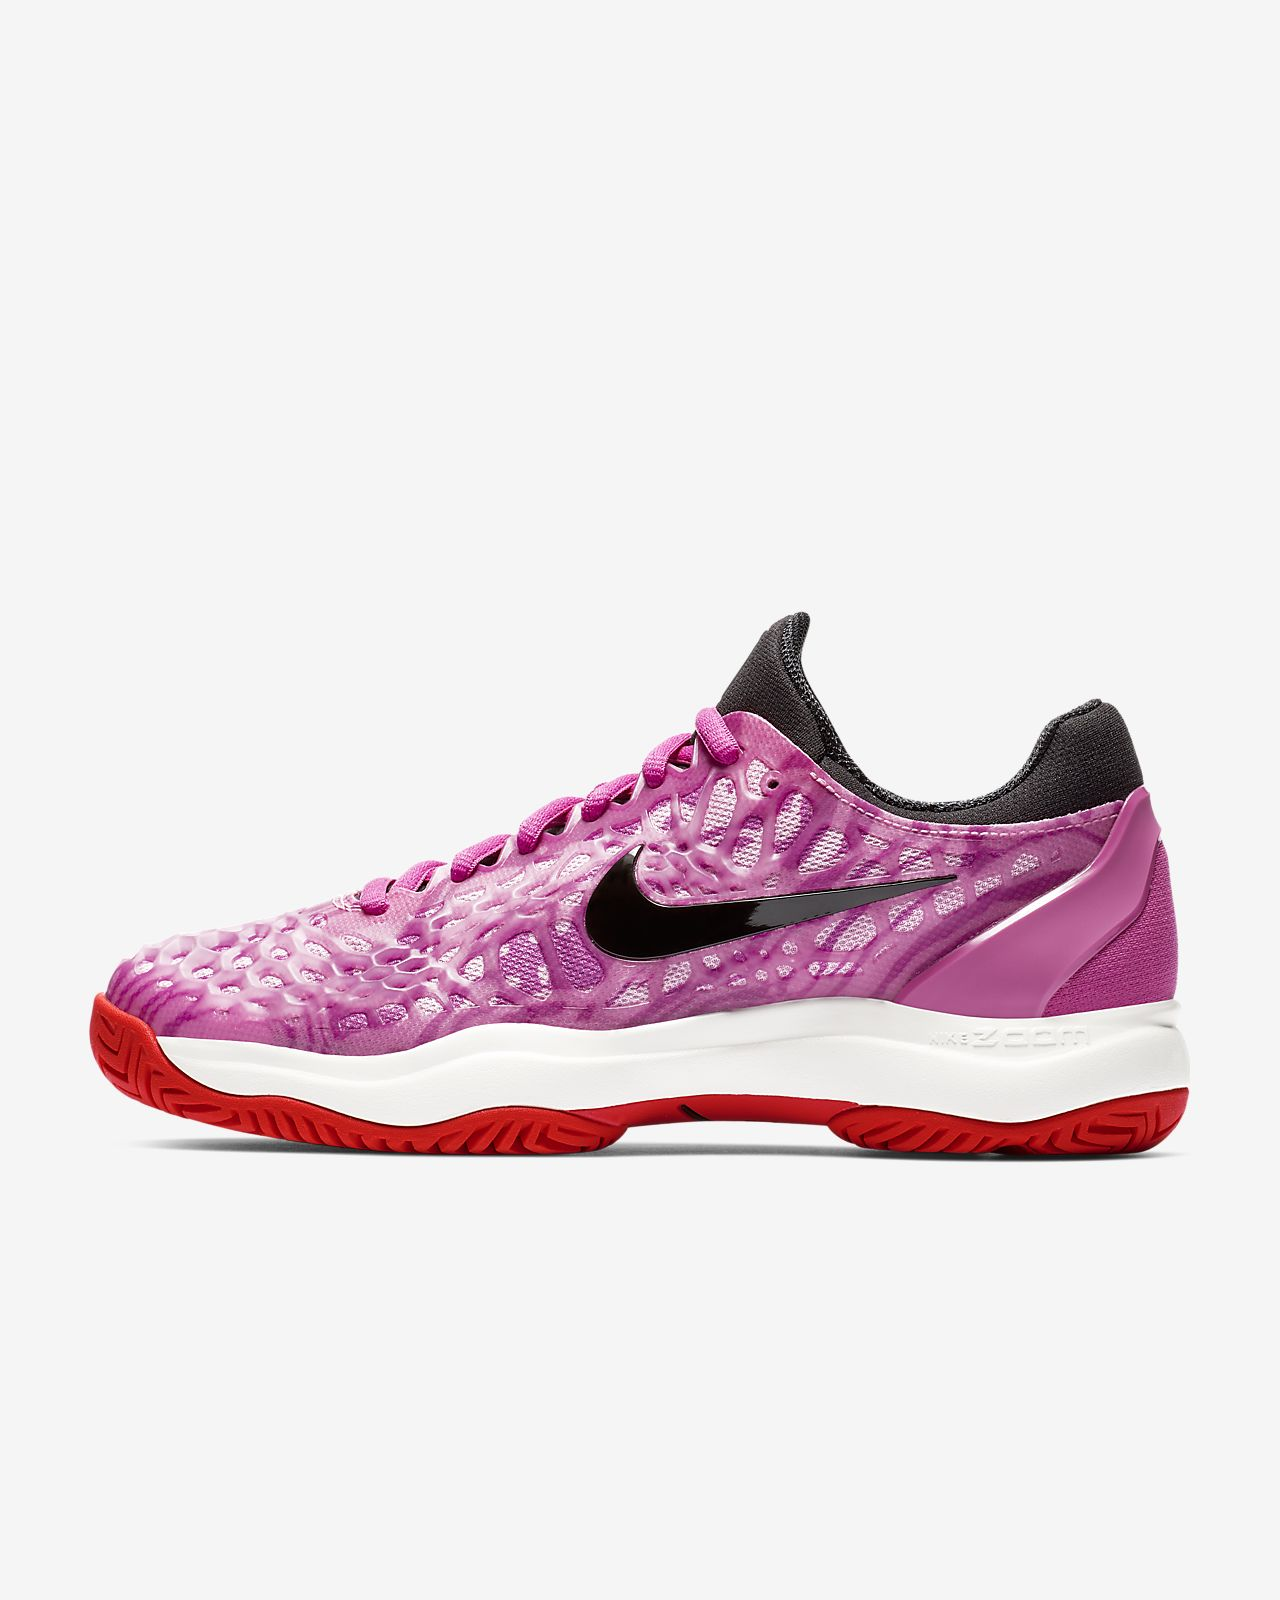 NikeCourt Zoom Cage 3 Women s Hard Court Tennis Shoe. Nike.com 7ebc2b78f700